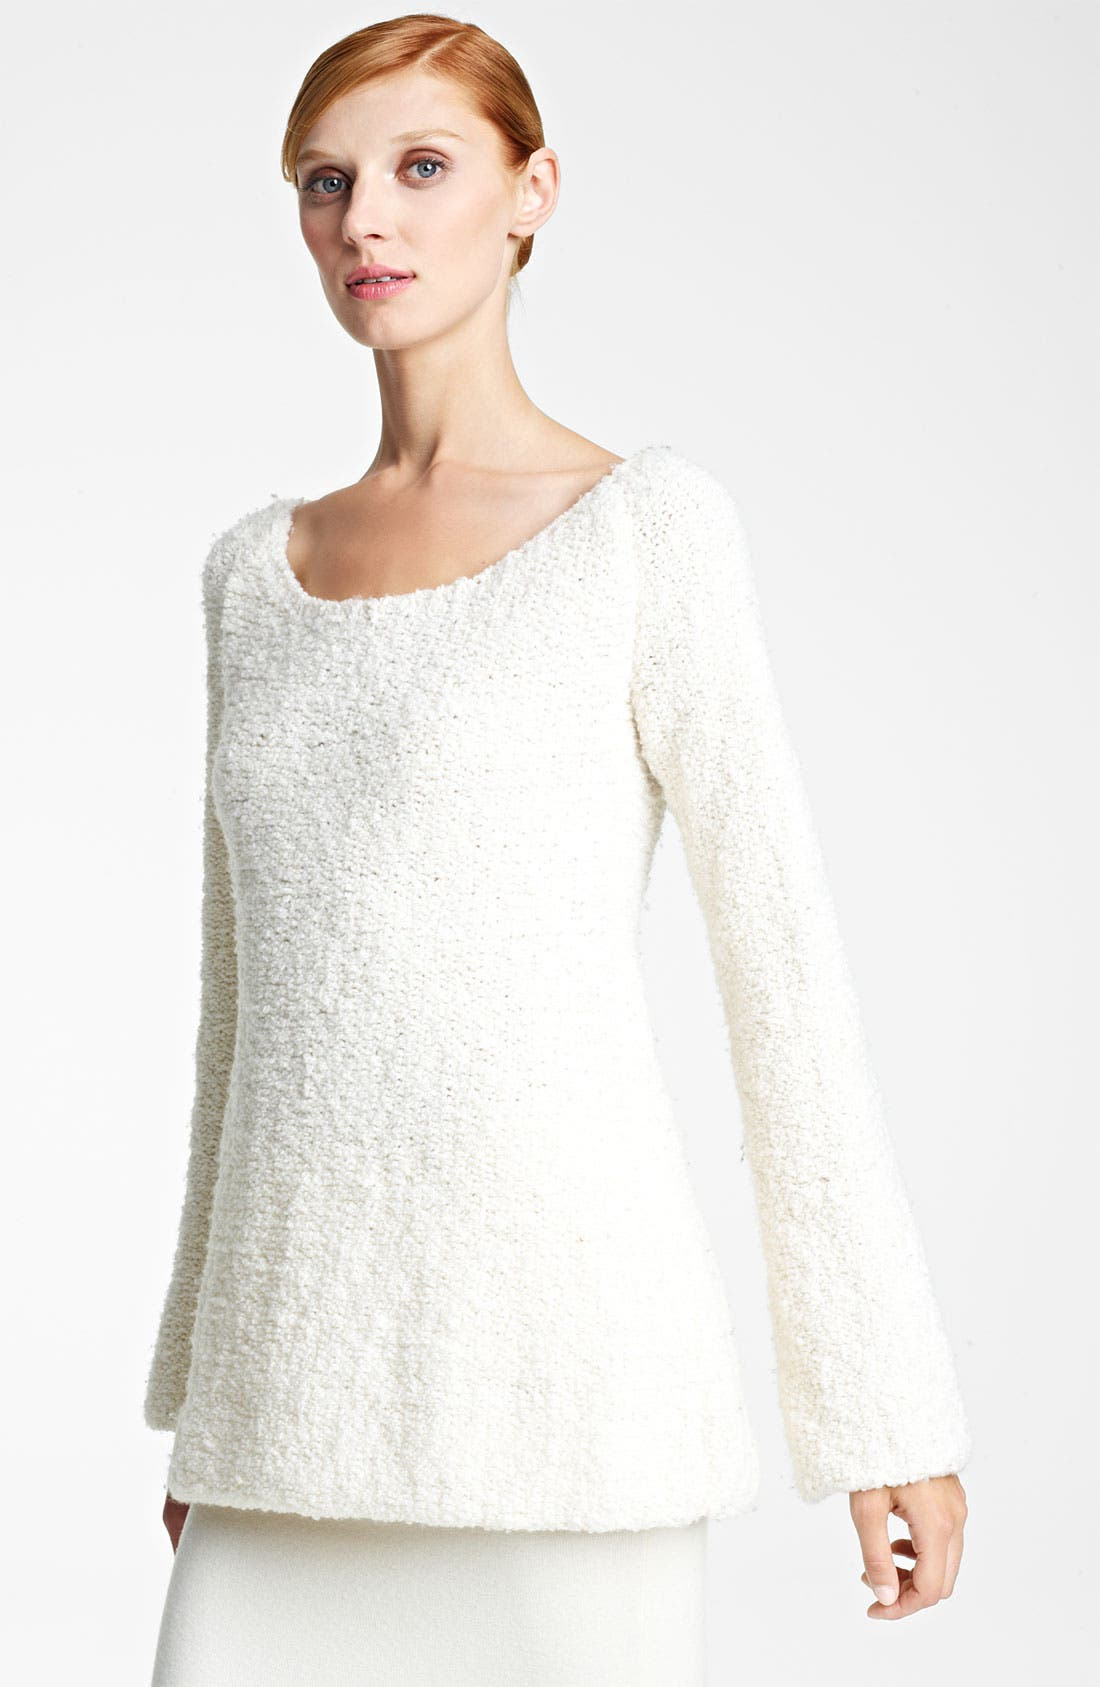 Alternate Image 1 Selected - Donna Karan Collection Bouclé Wool & Cashmere Sweater